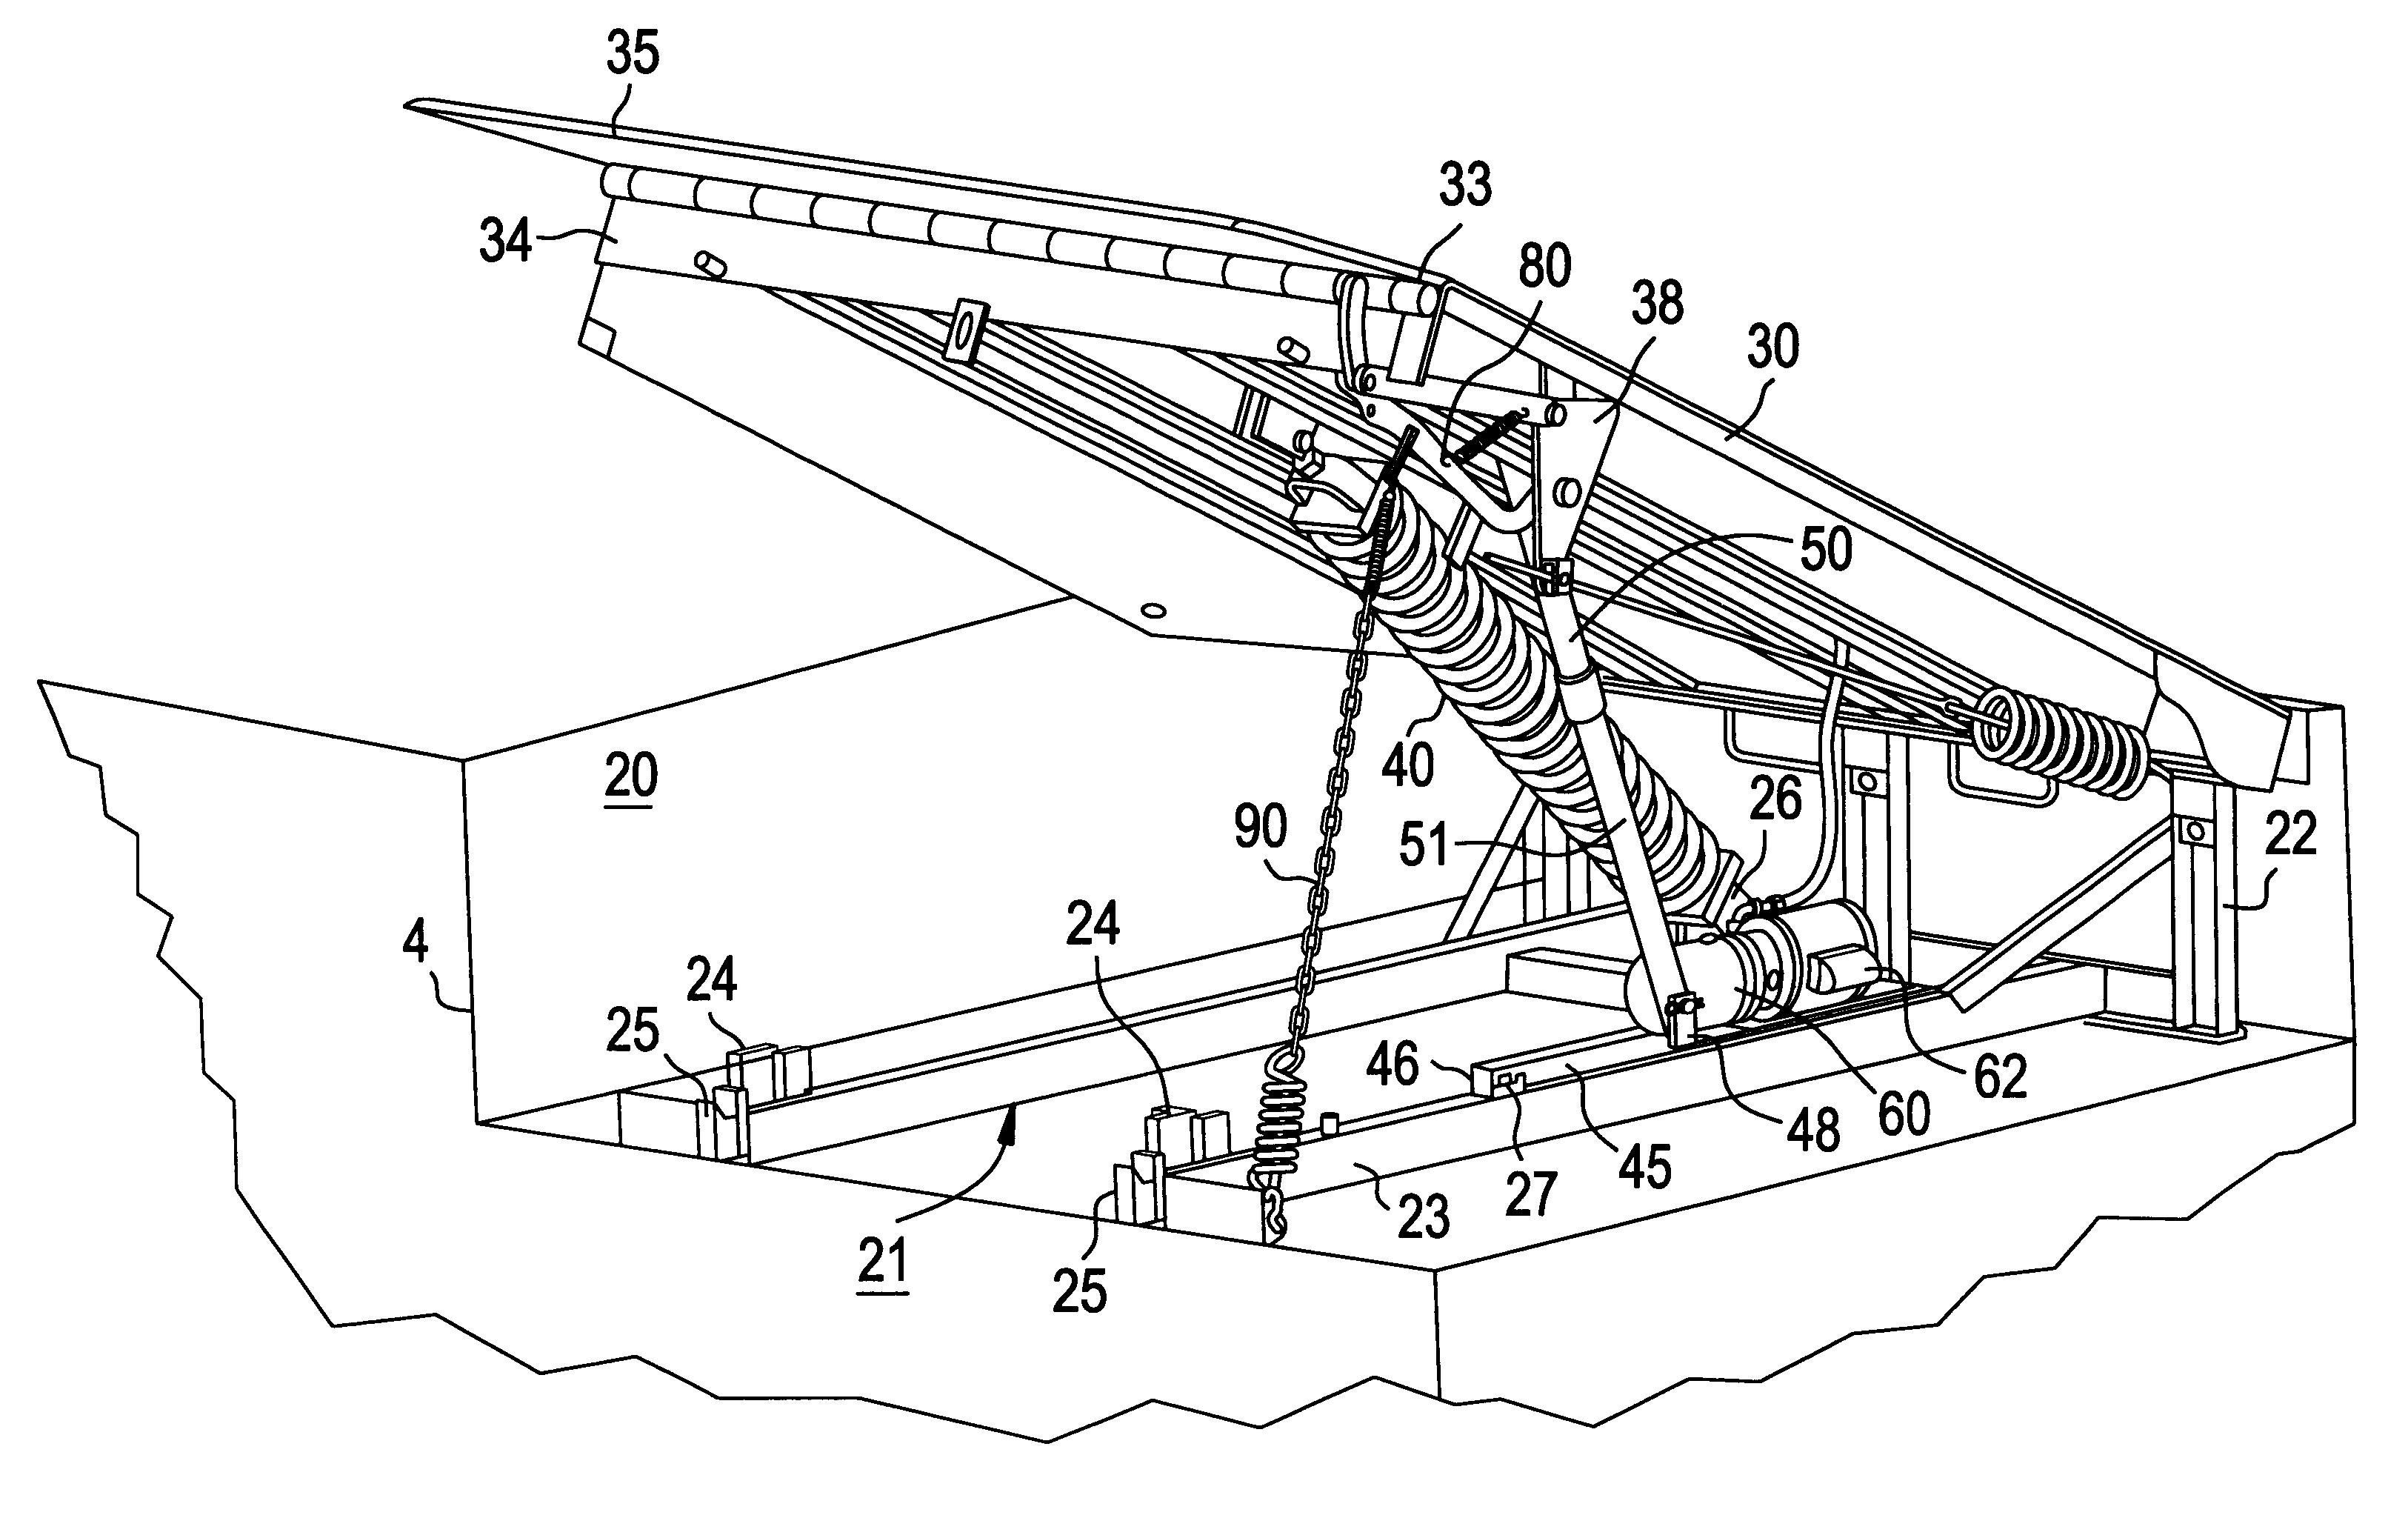 serco dock leveler parts manual